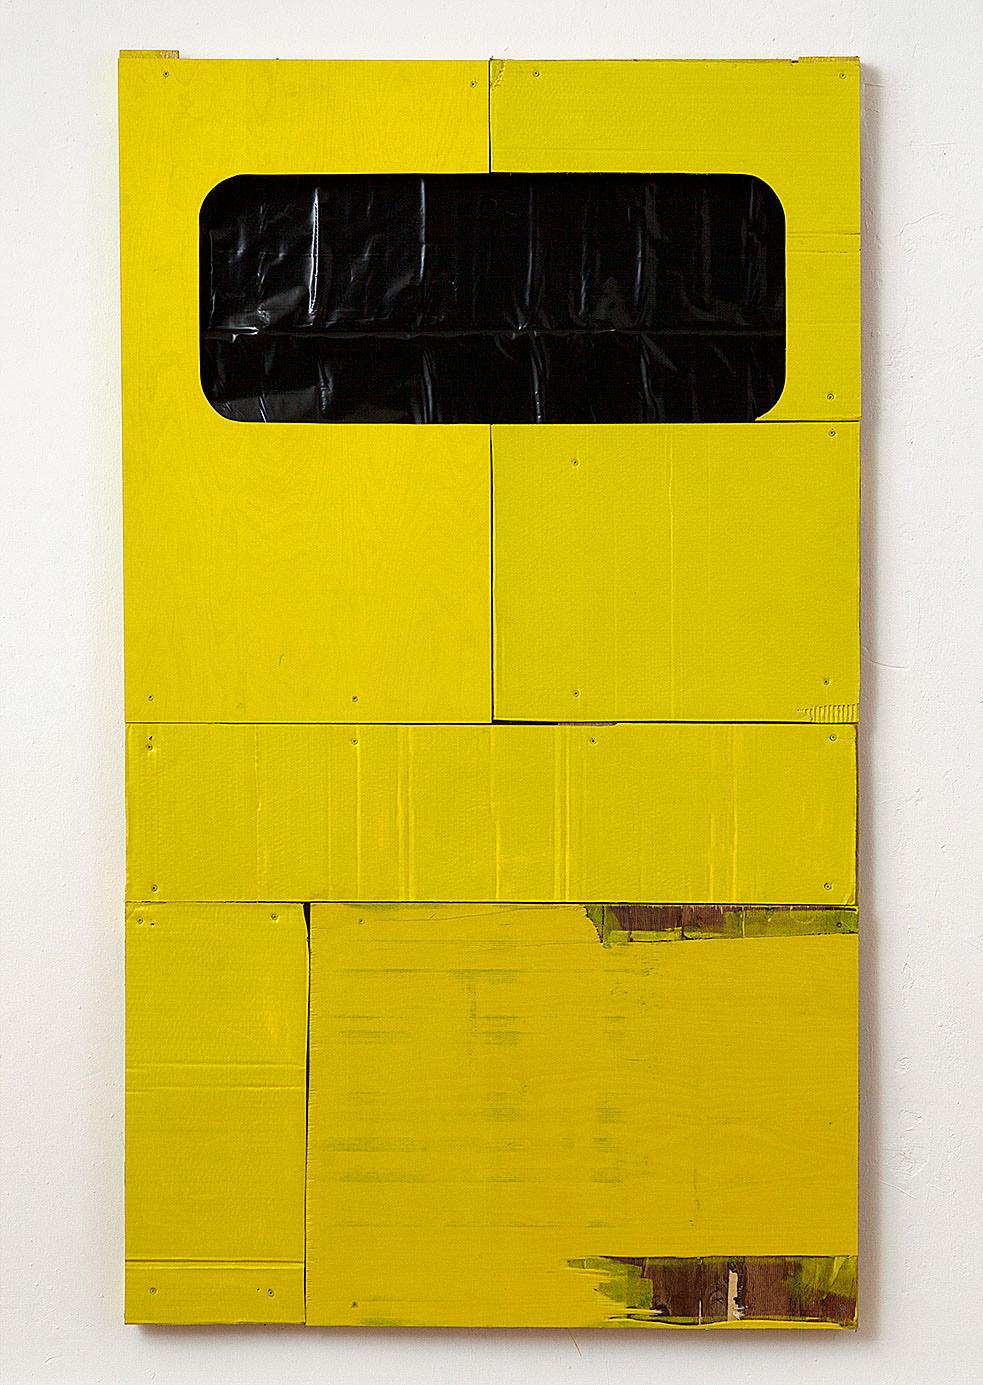 o.T., 2012; 100 x 175 cm